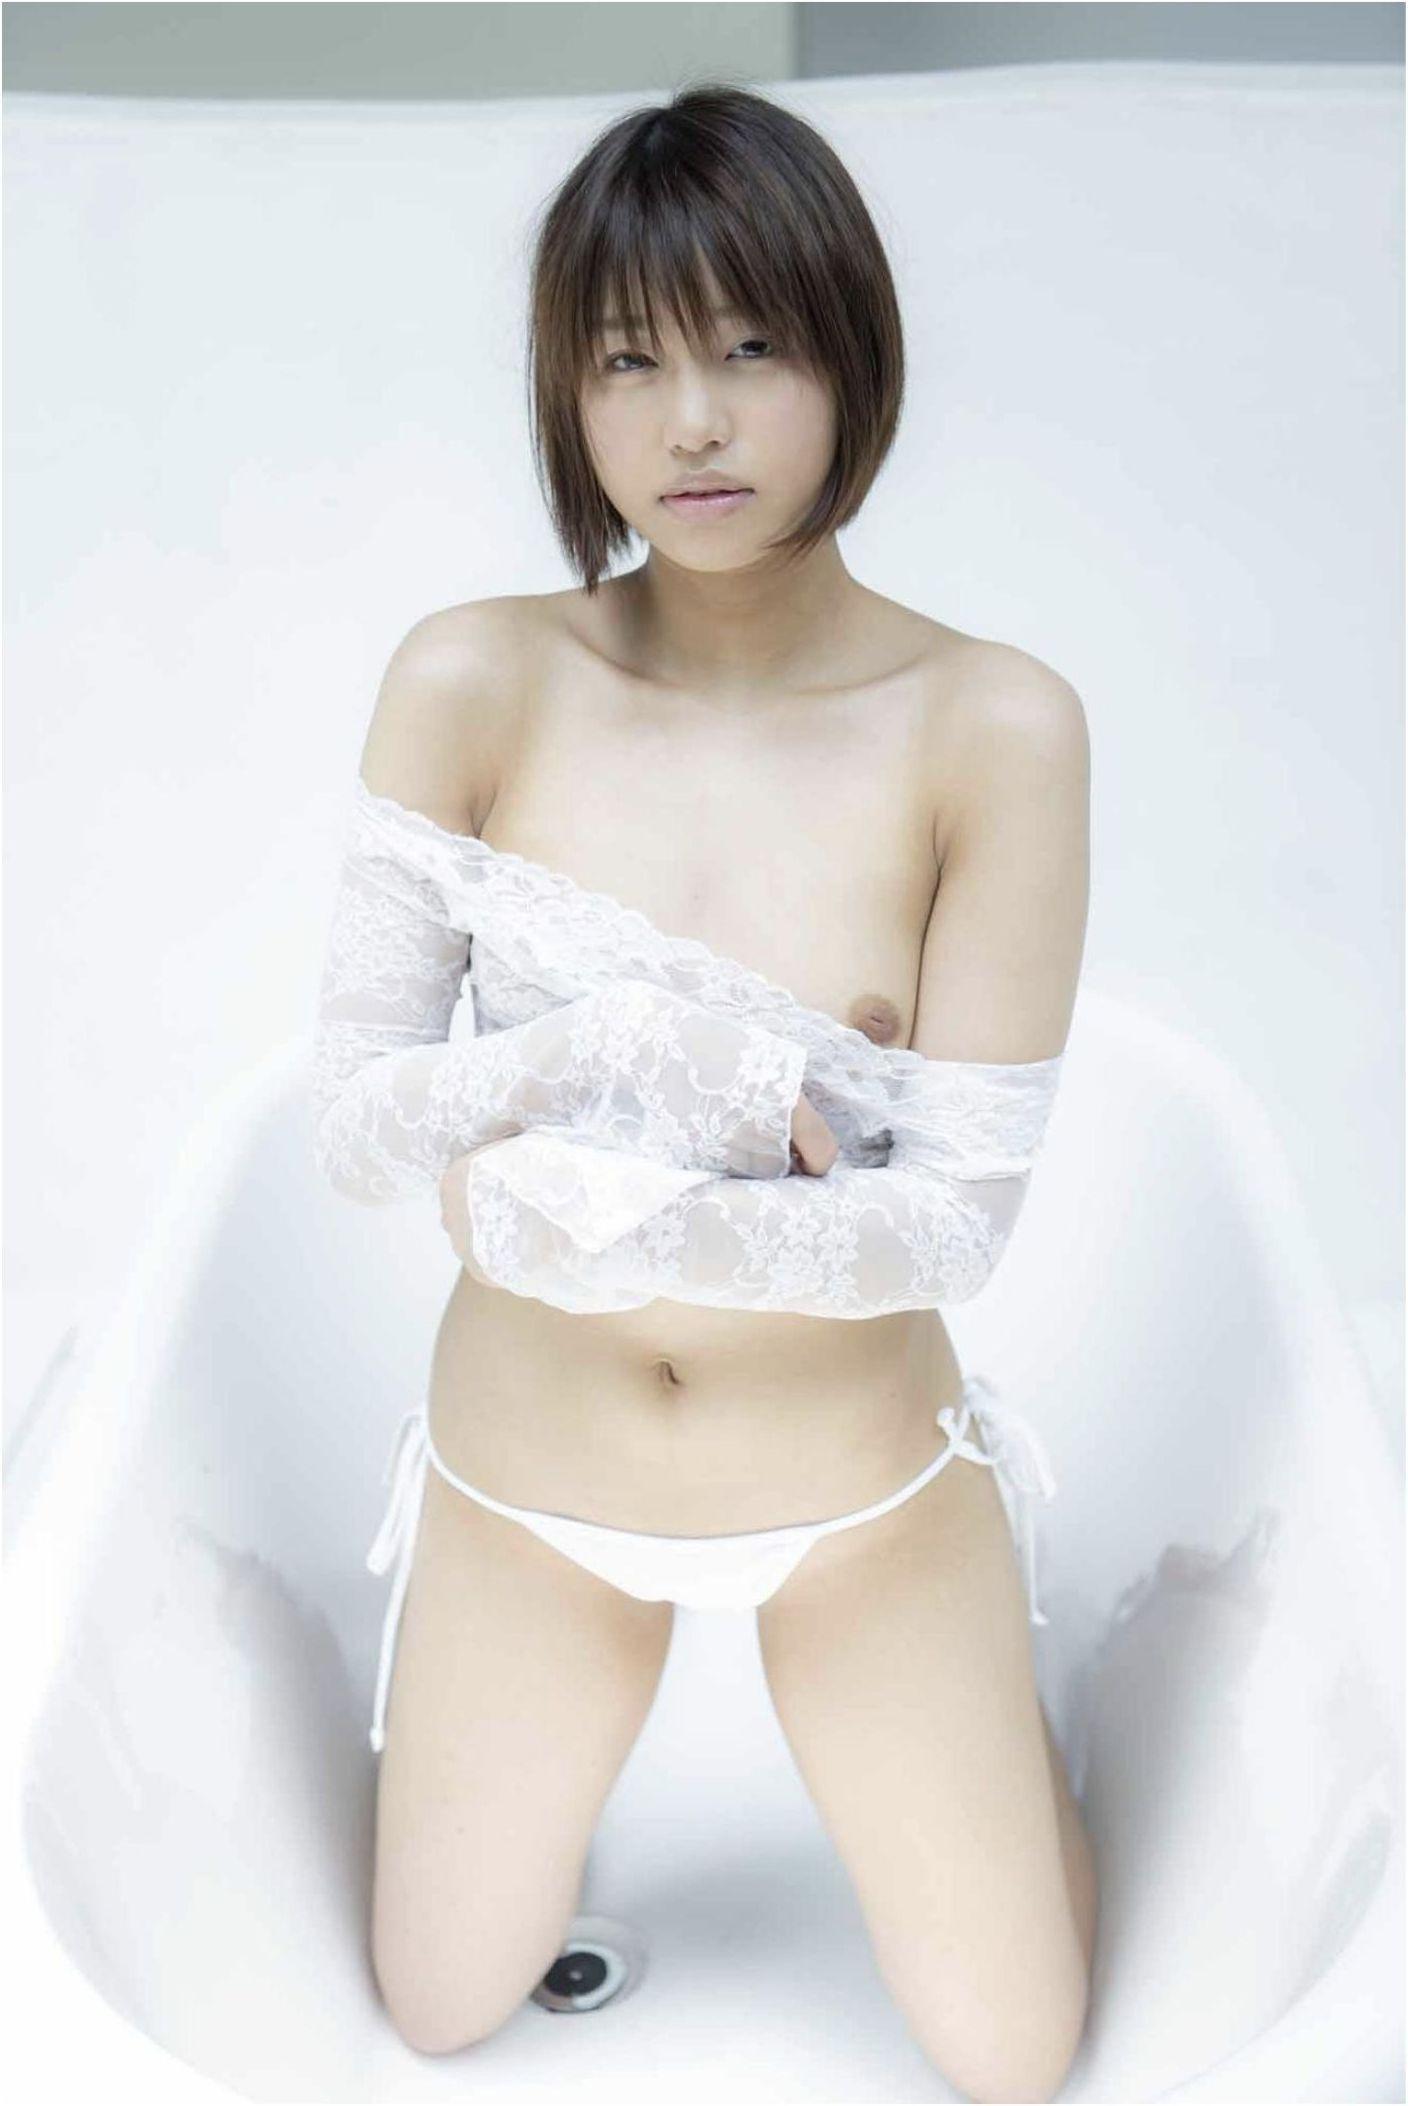 SOFT ON DEMAND GRAVURE COLLECTION 唯井まひろ01 photo 052